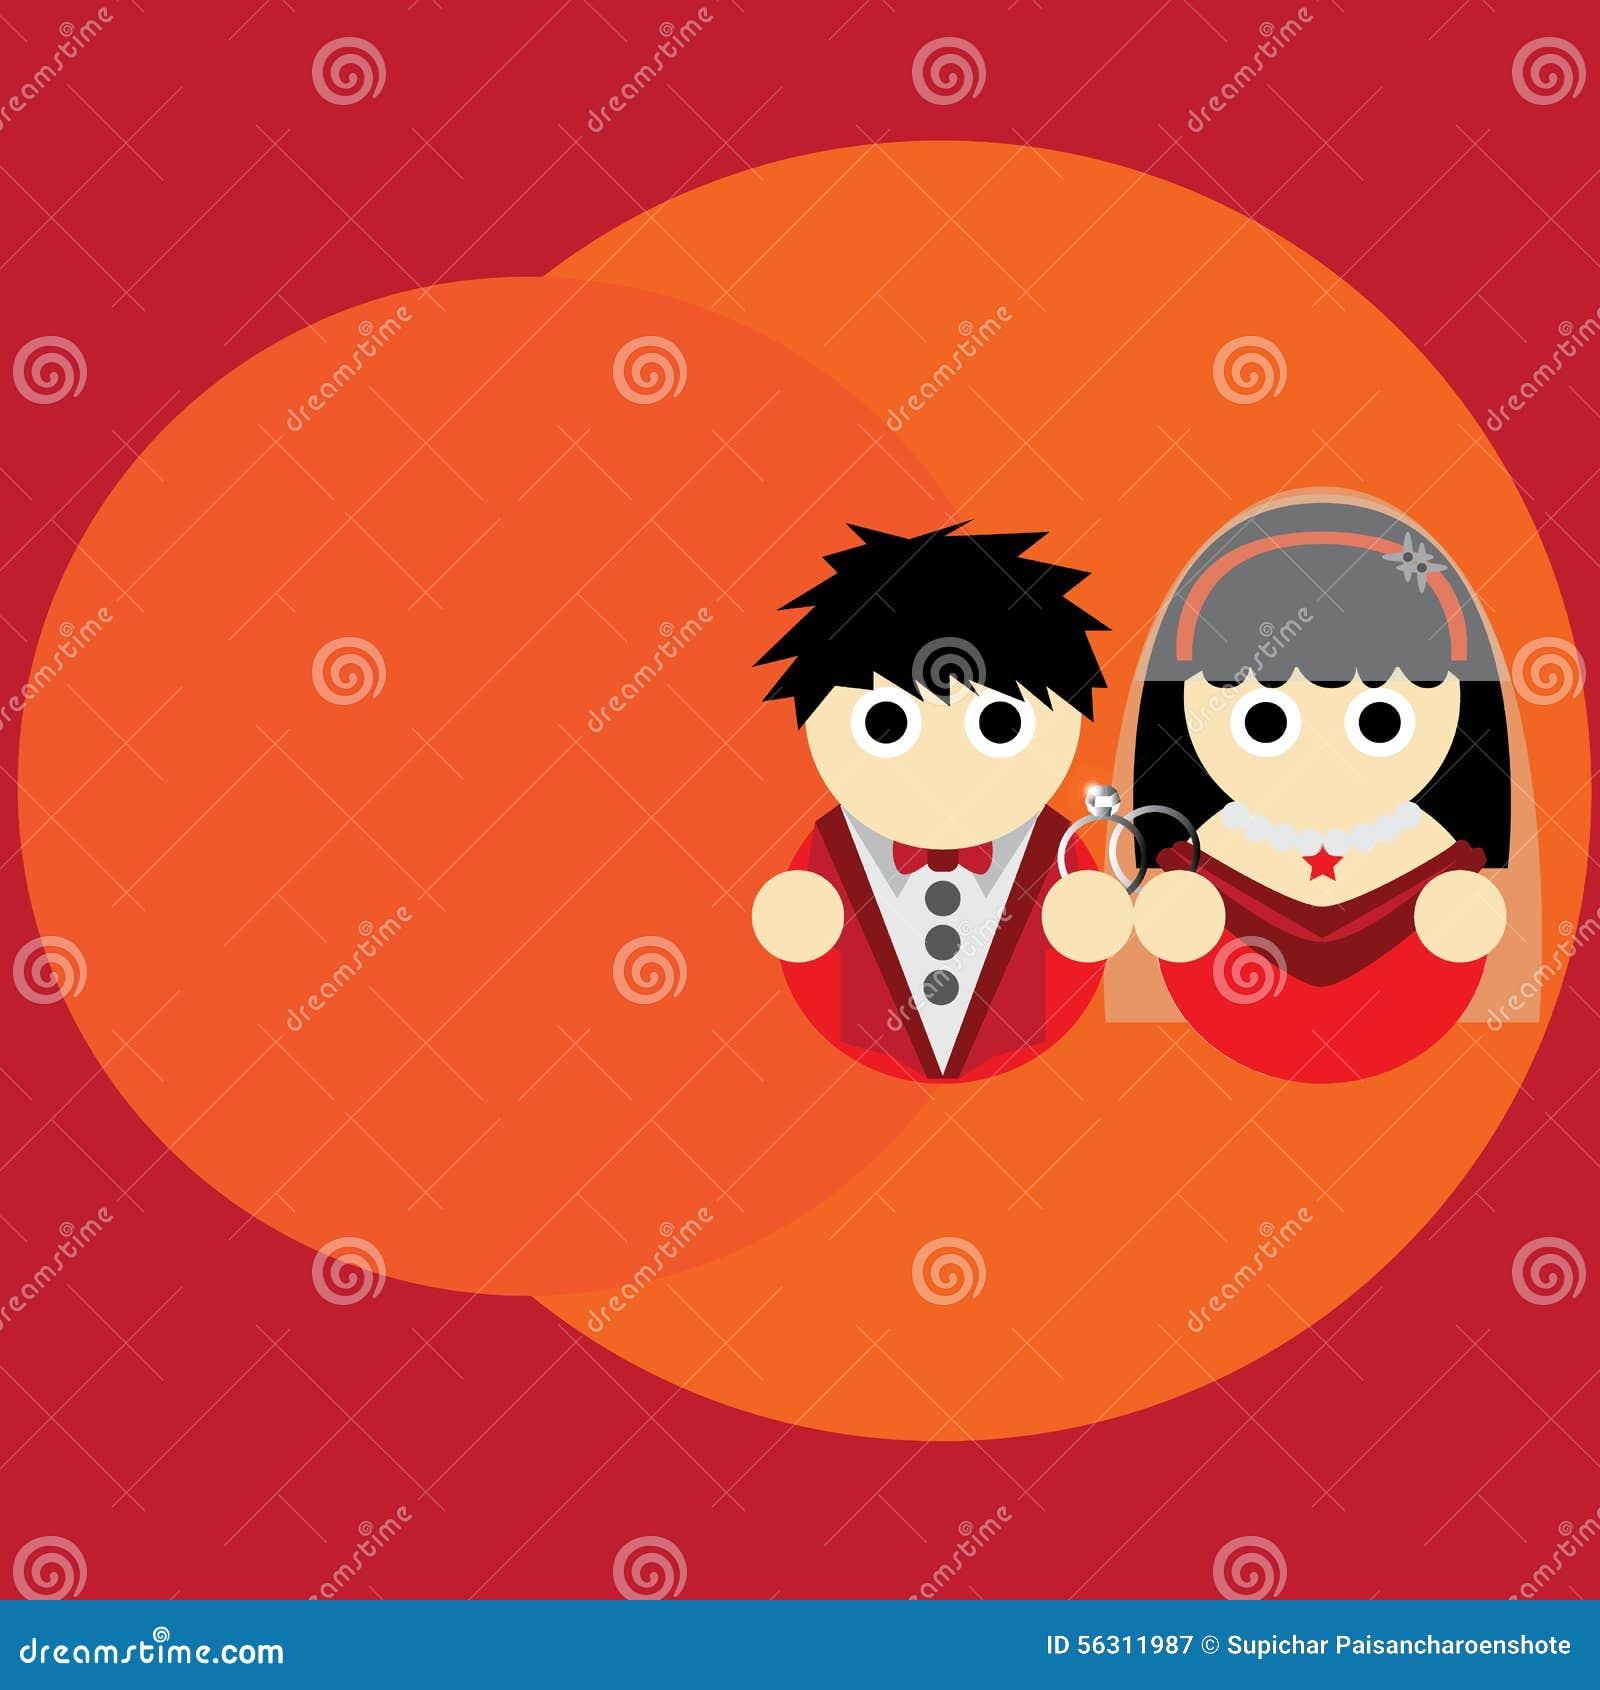 Wedding Cartoon Illustration Background Stock Vector